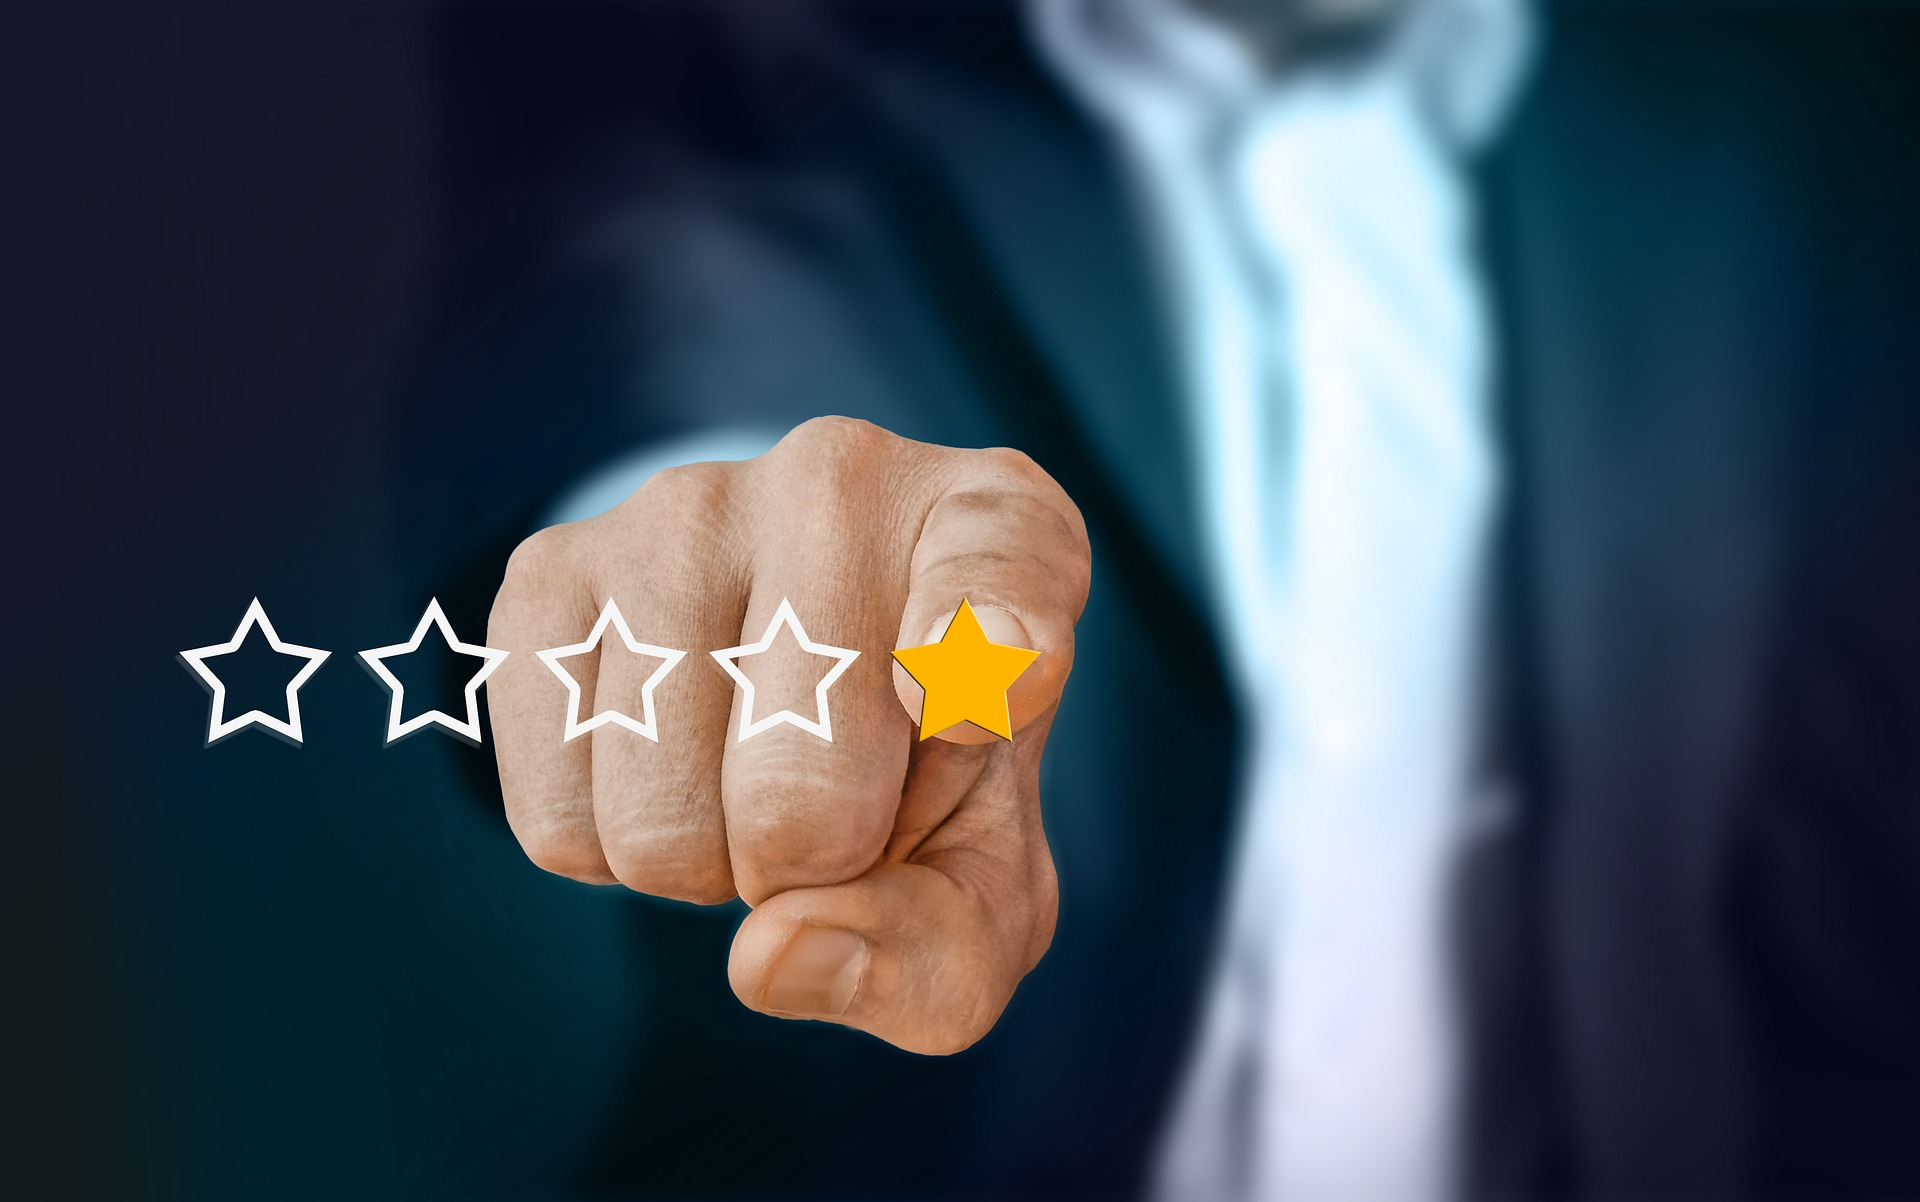 Is Prodstop a Scam or an Untrustworthy Online Store?